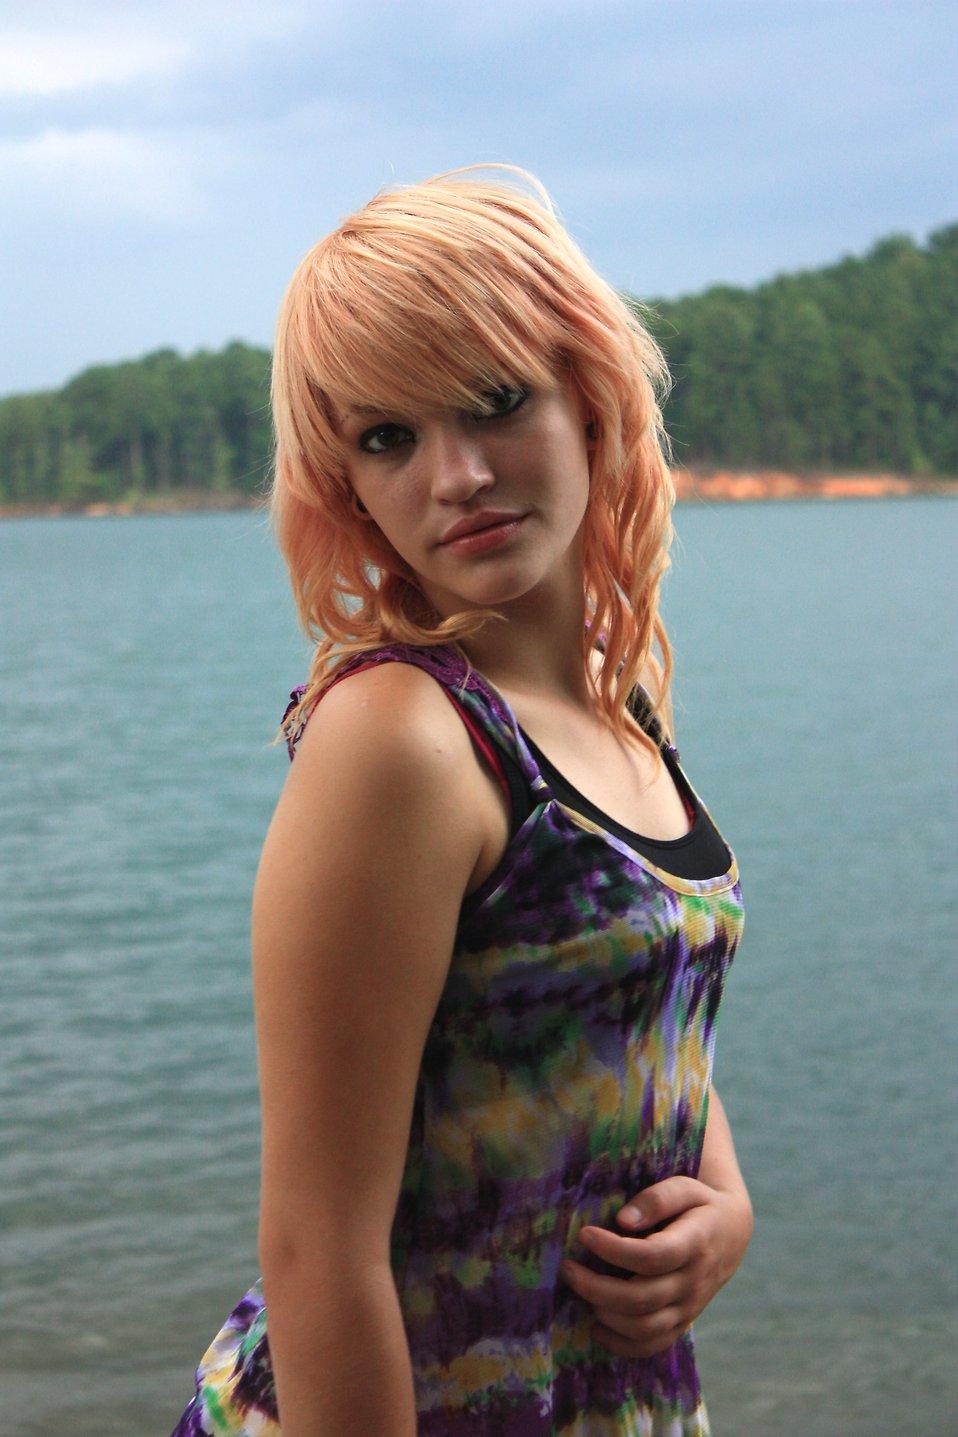 A beautiful young woman posing by a lake : Free Stock Photo